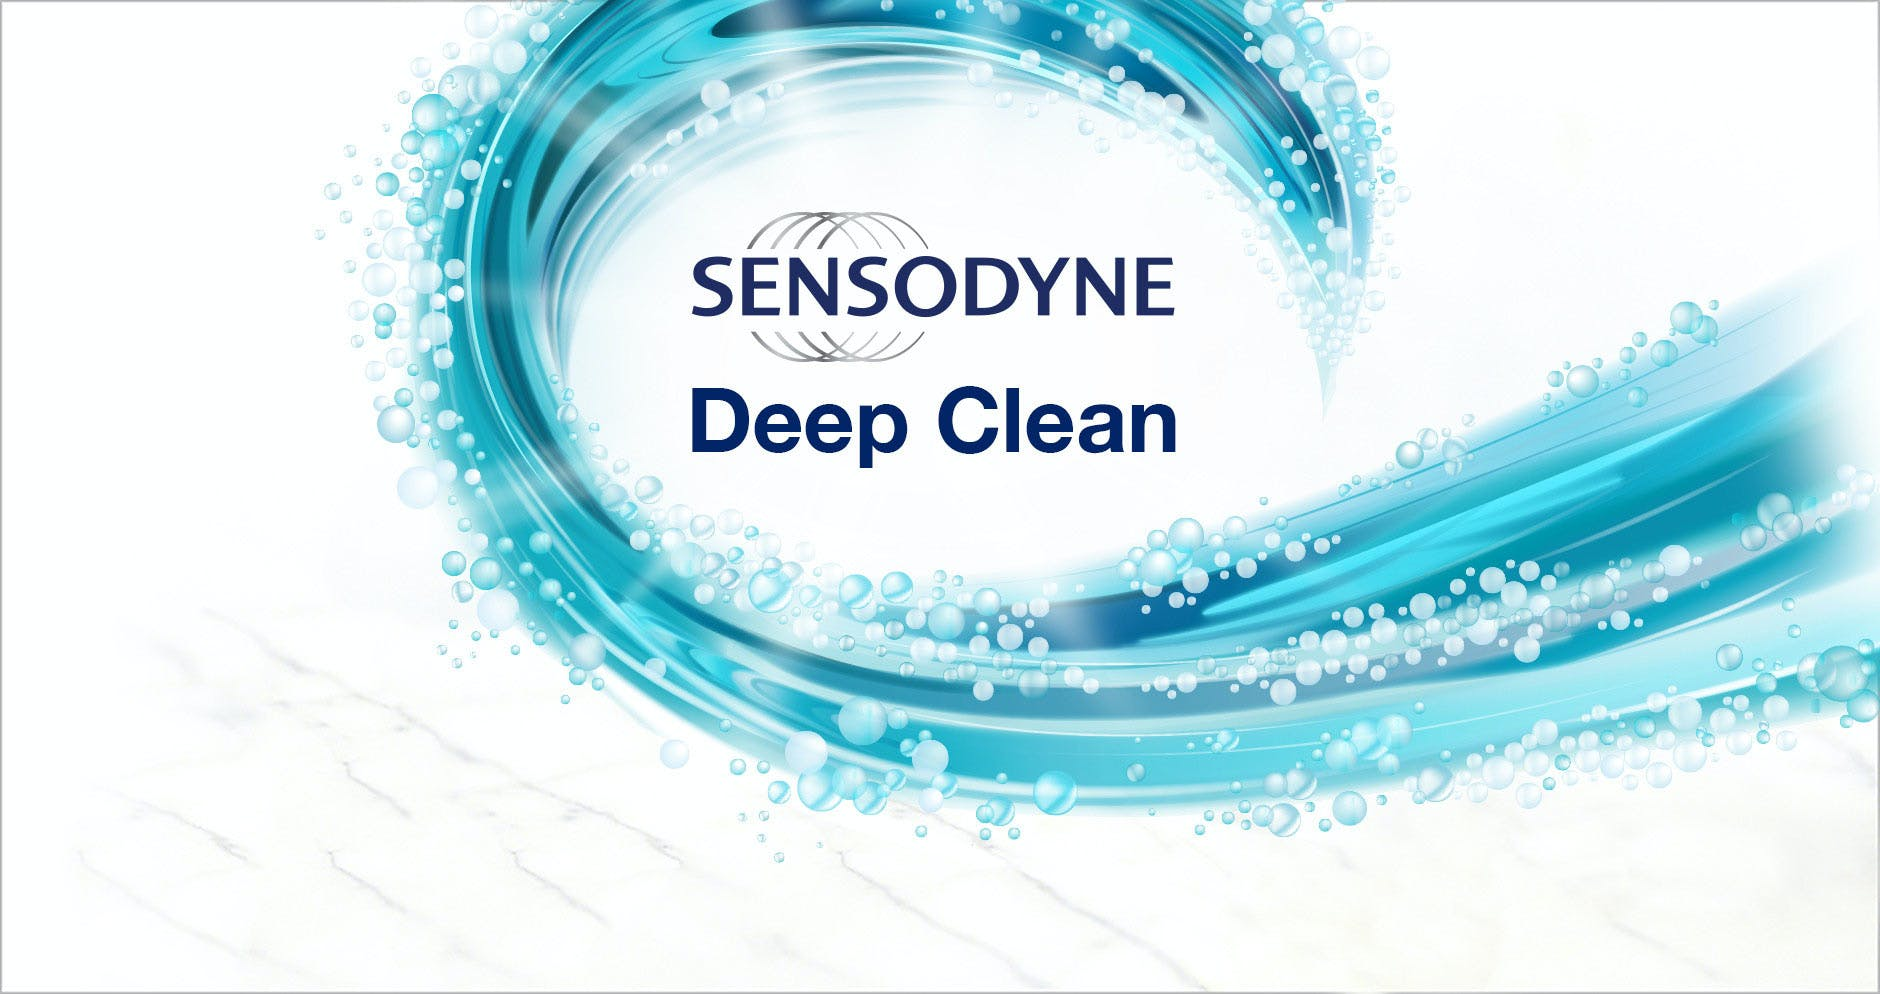 Deep clean sensitive teeth with Sensodyne